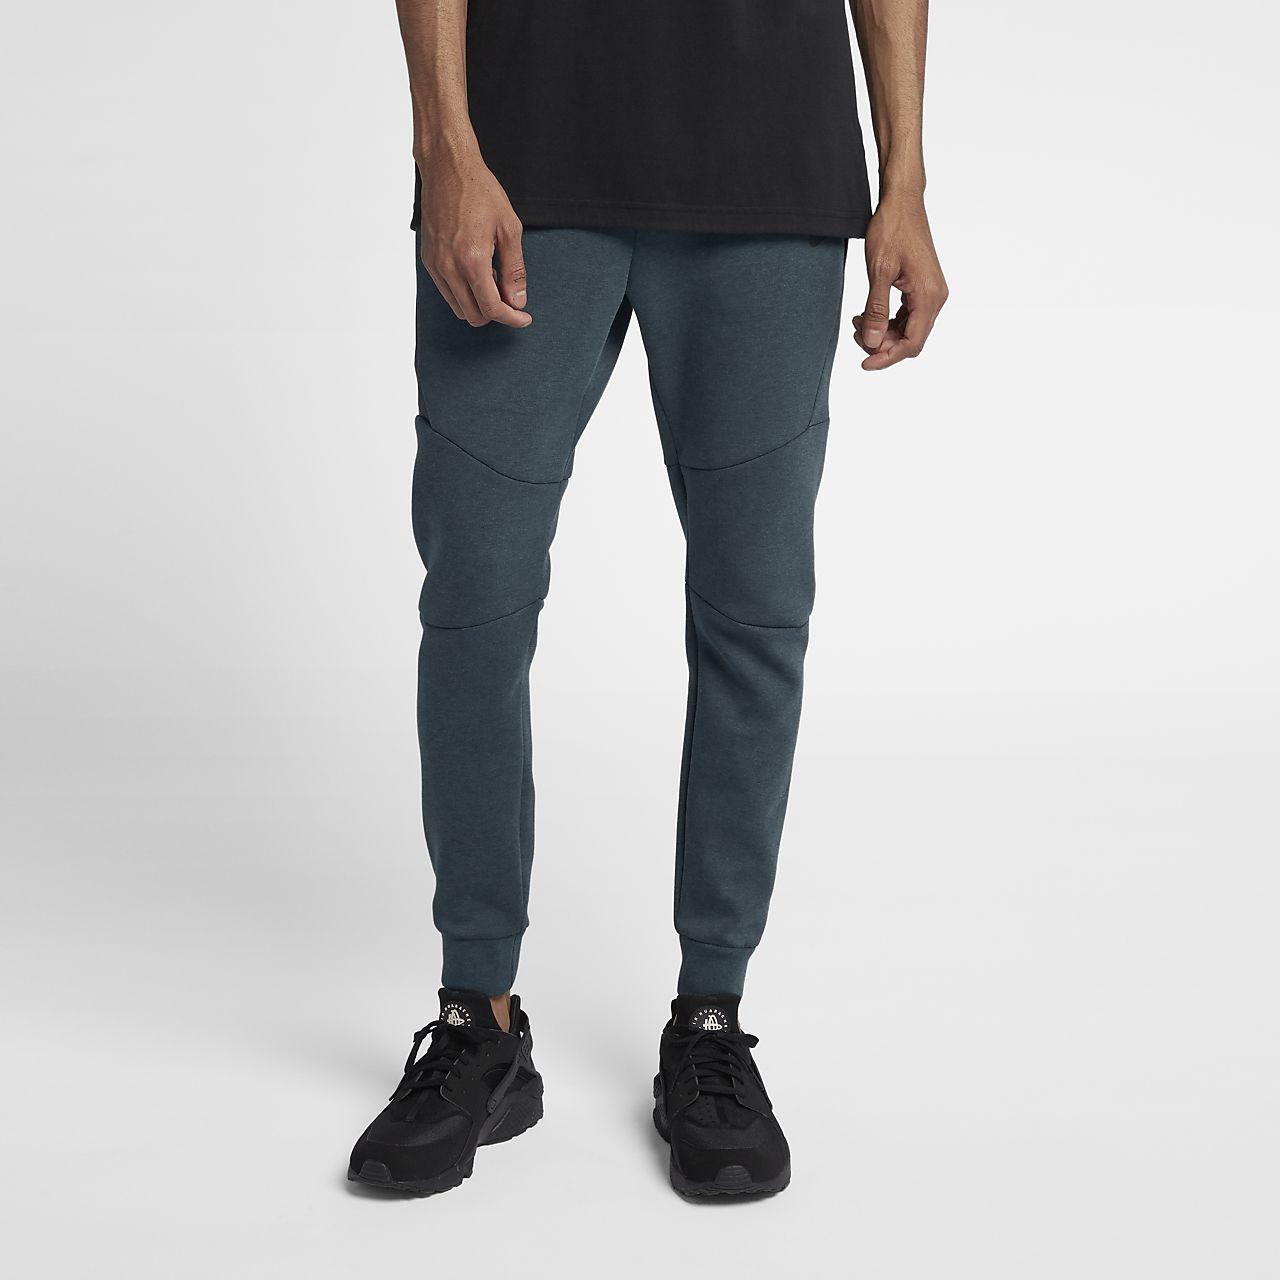 ... Nike Sportswear Tech Fleece Pantalón deportivo - Hombre